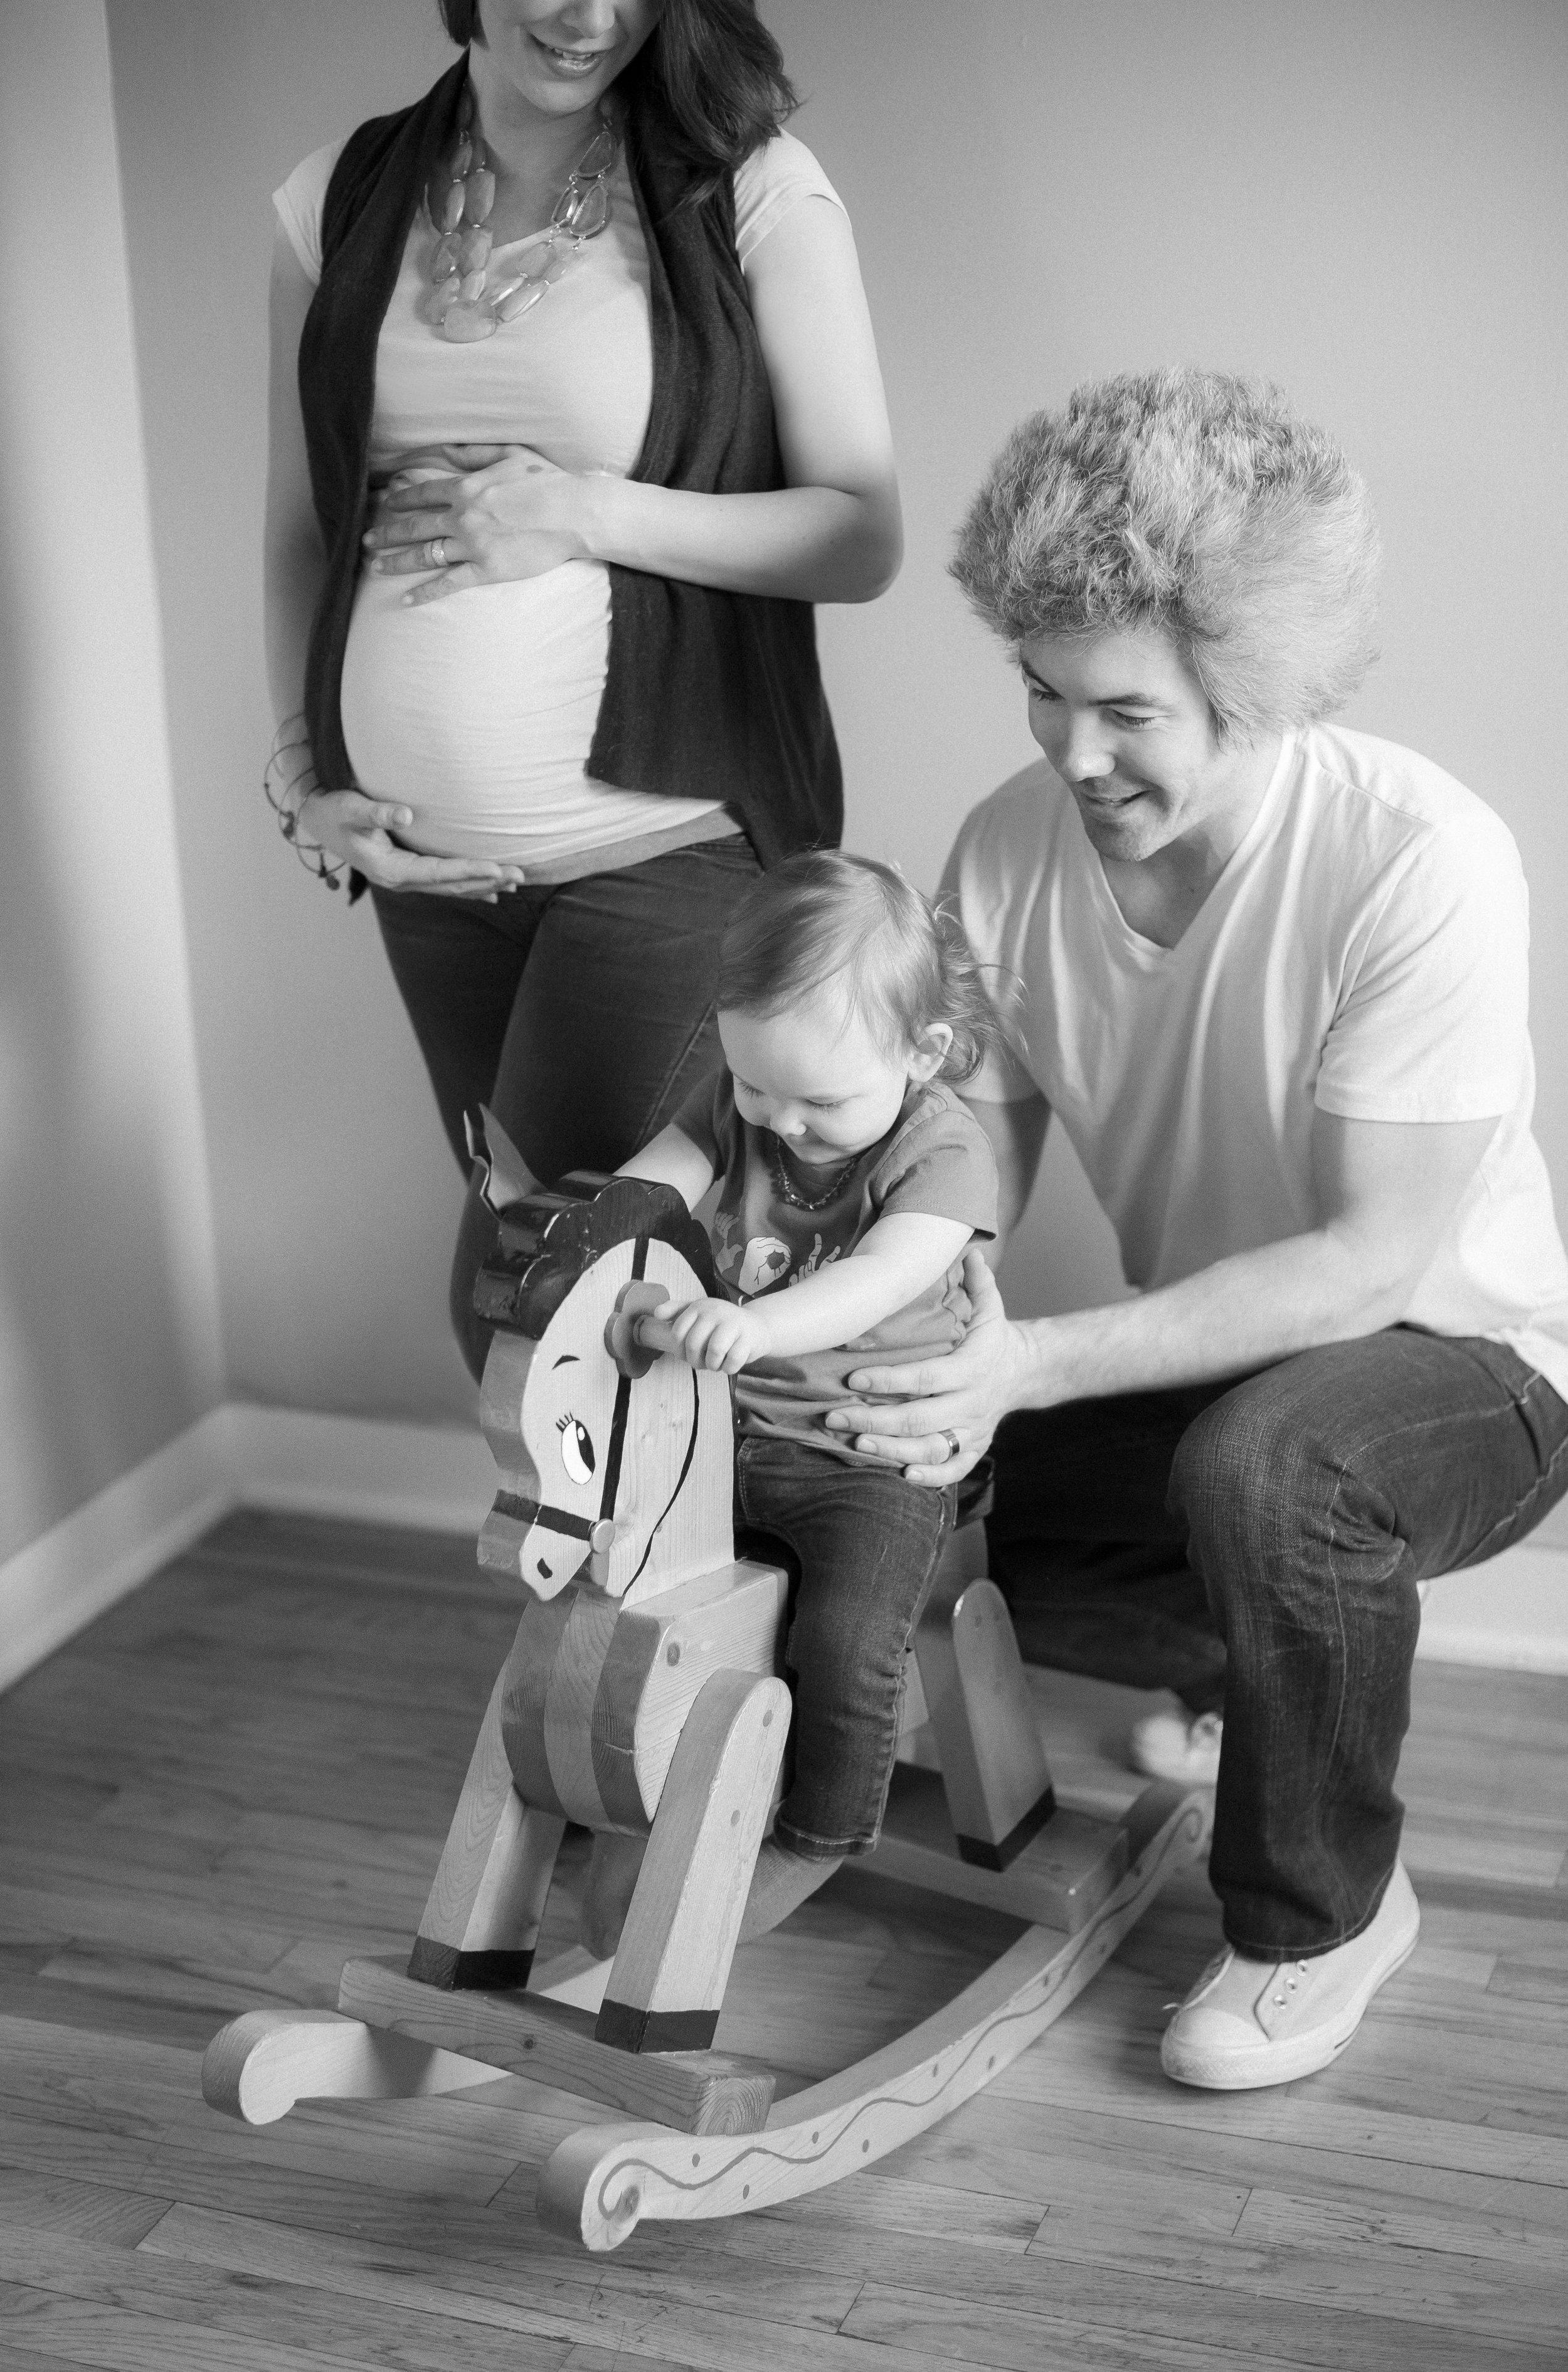 kmulhern_photography_baby_2_mulhern_maternity_MAR_2017_041.jpg